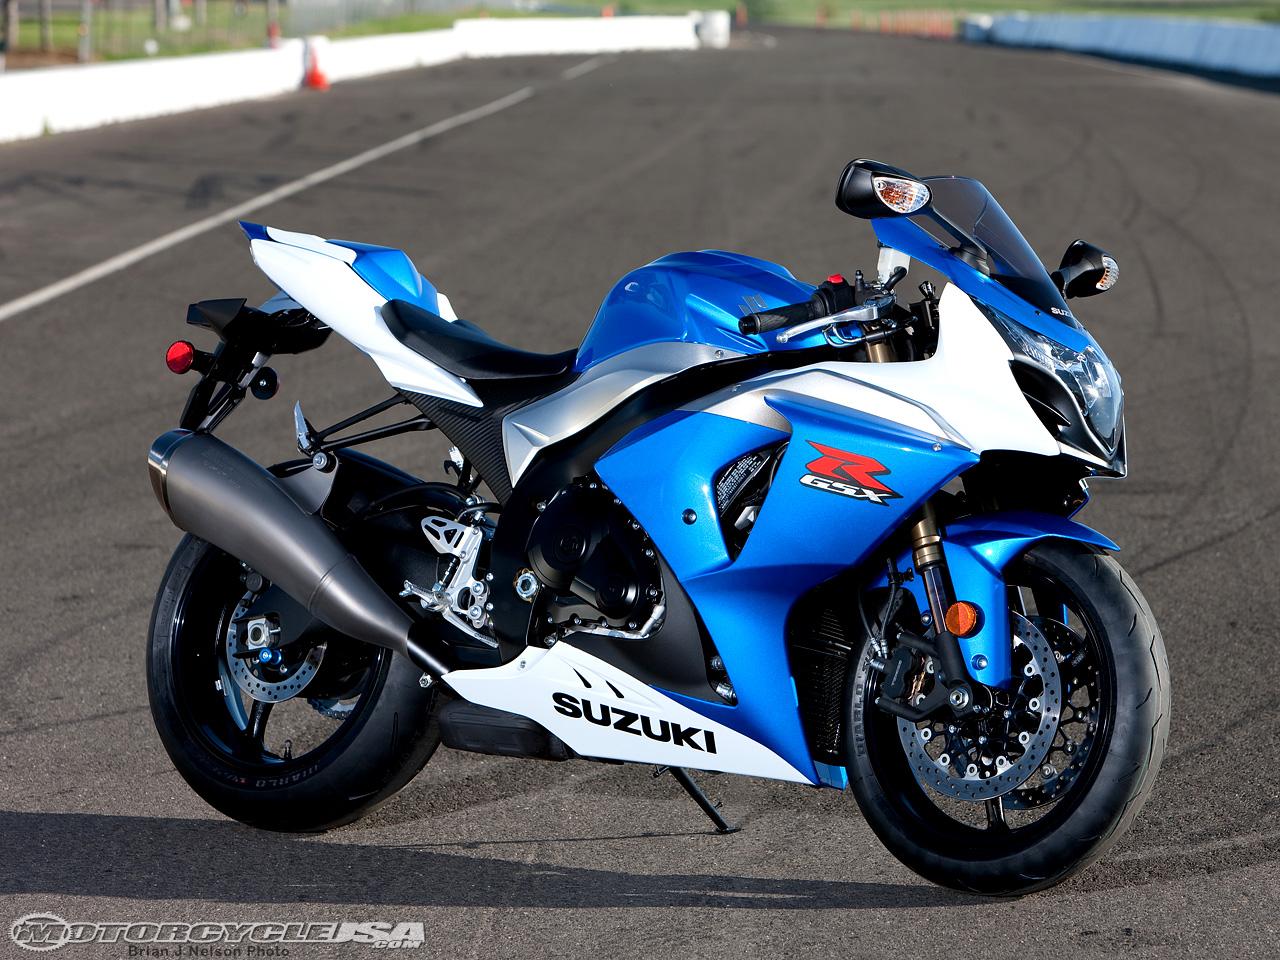 gambar+motor+sport+suzuki+01 | moto modif